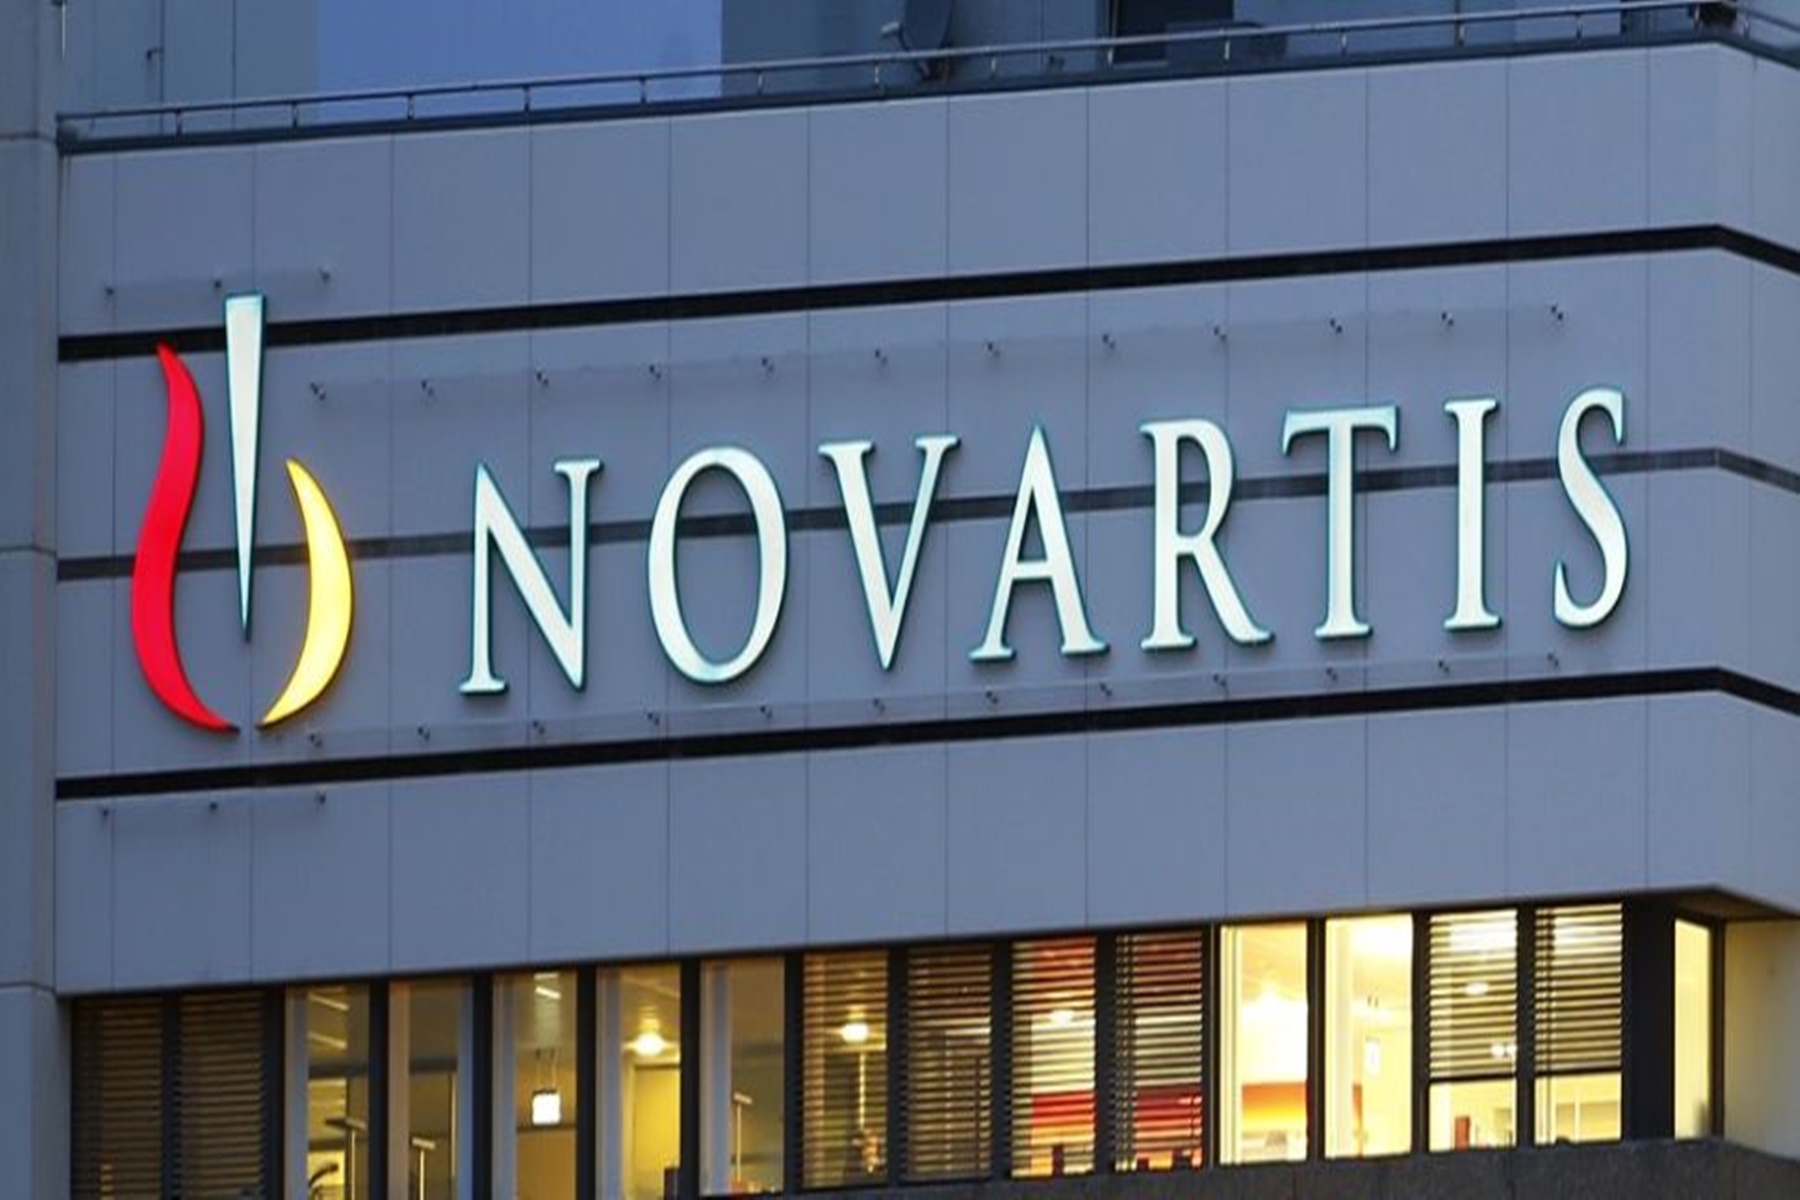 Novartis βιώσιμη ανάπτυξη: Συνεπής στις επενδύσεις στην Ελλάδα το 2020 με επίκεντρο τα ΕSG